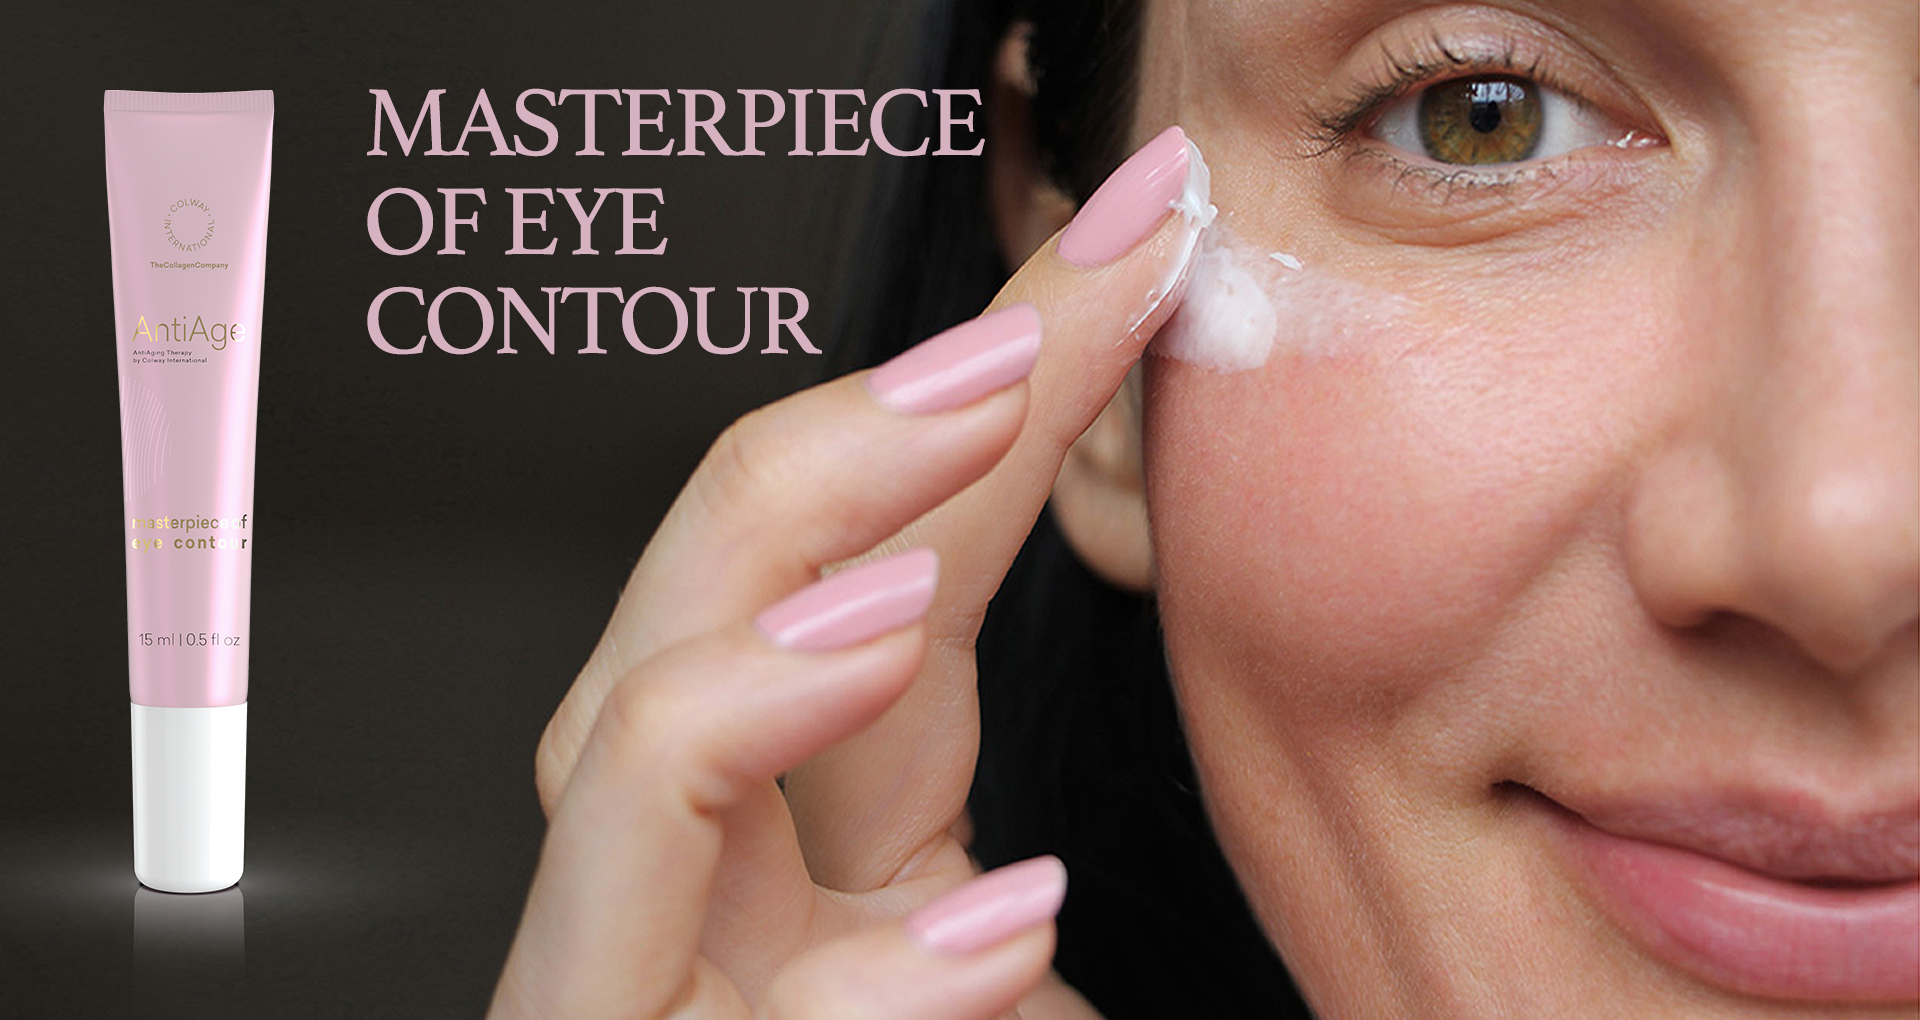 eye contour masterpiece